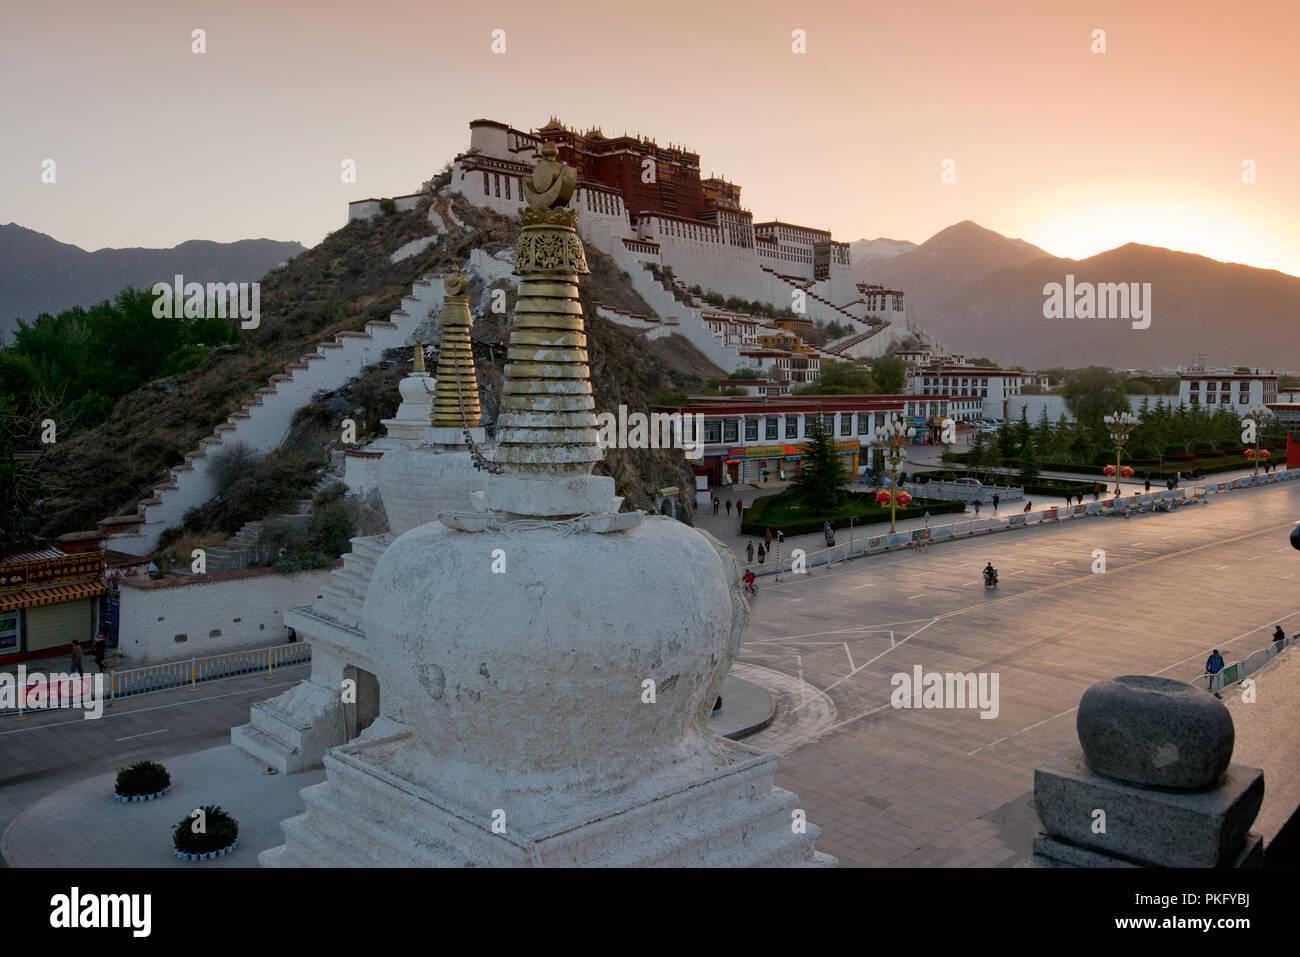 The Potala, sunrise at the winter palace of the Dalai Lama, Lhasa, Tibet, China - Stock Image